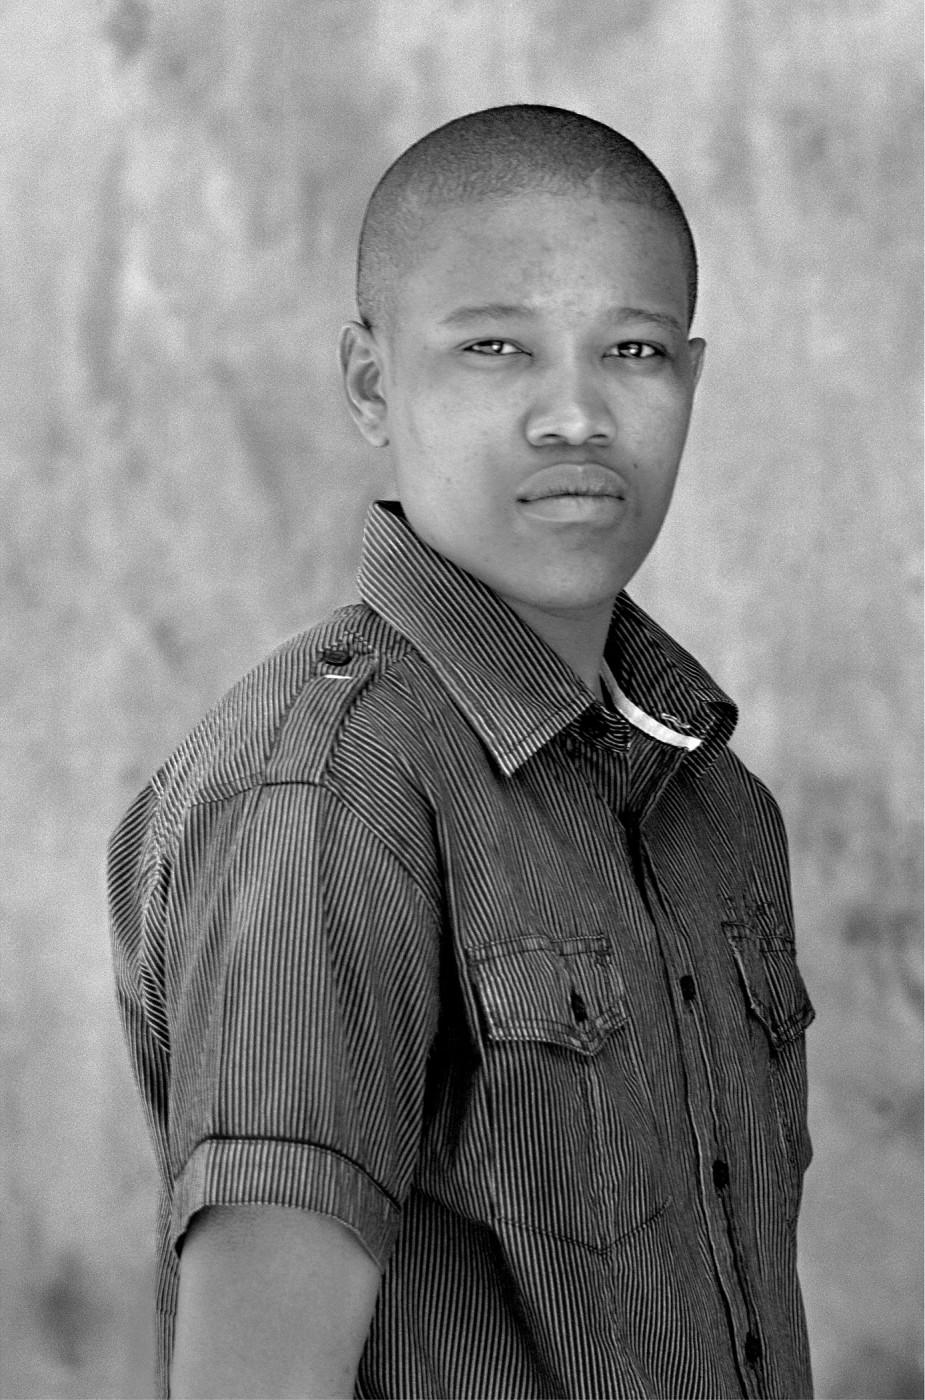 Zanele Muholi, </span><span><em>Betesta Segale, Gaborone, Botswana</em>, </span><span>2010 © Zanele Muholi and Stevenson Cape Town/Johannesburg